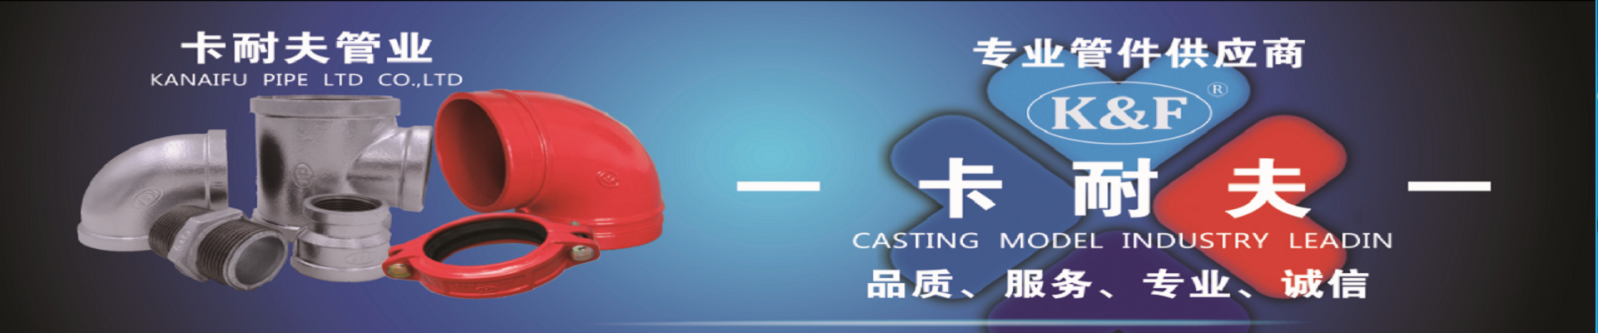 http://www.kanaifu.com.cn/